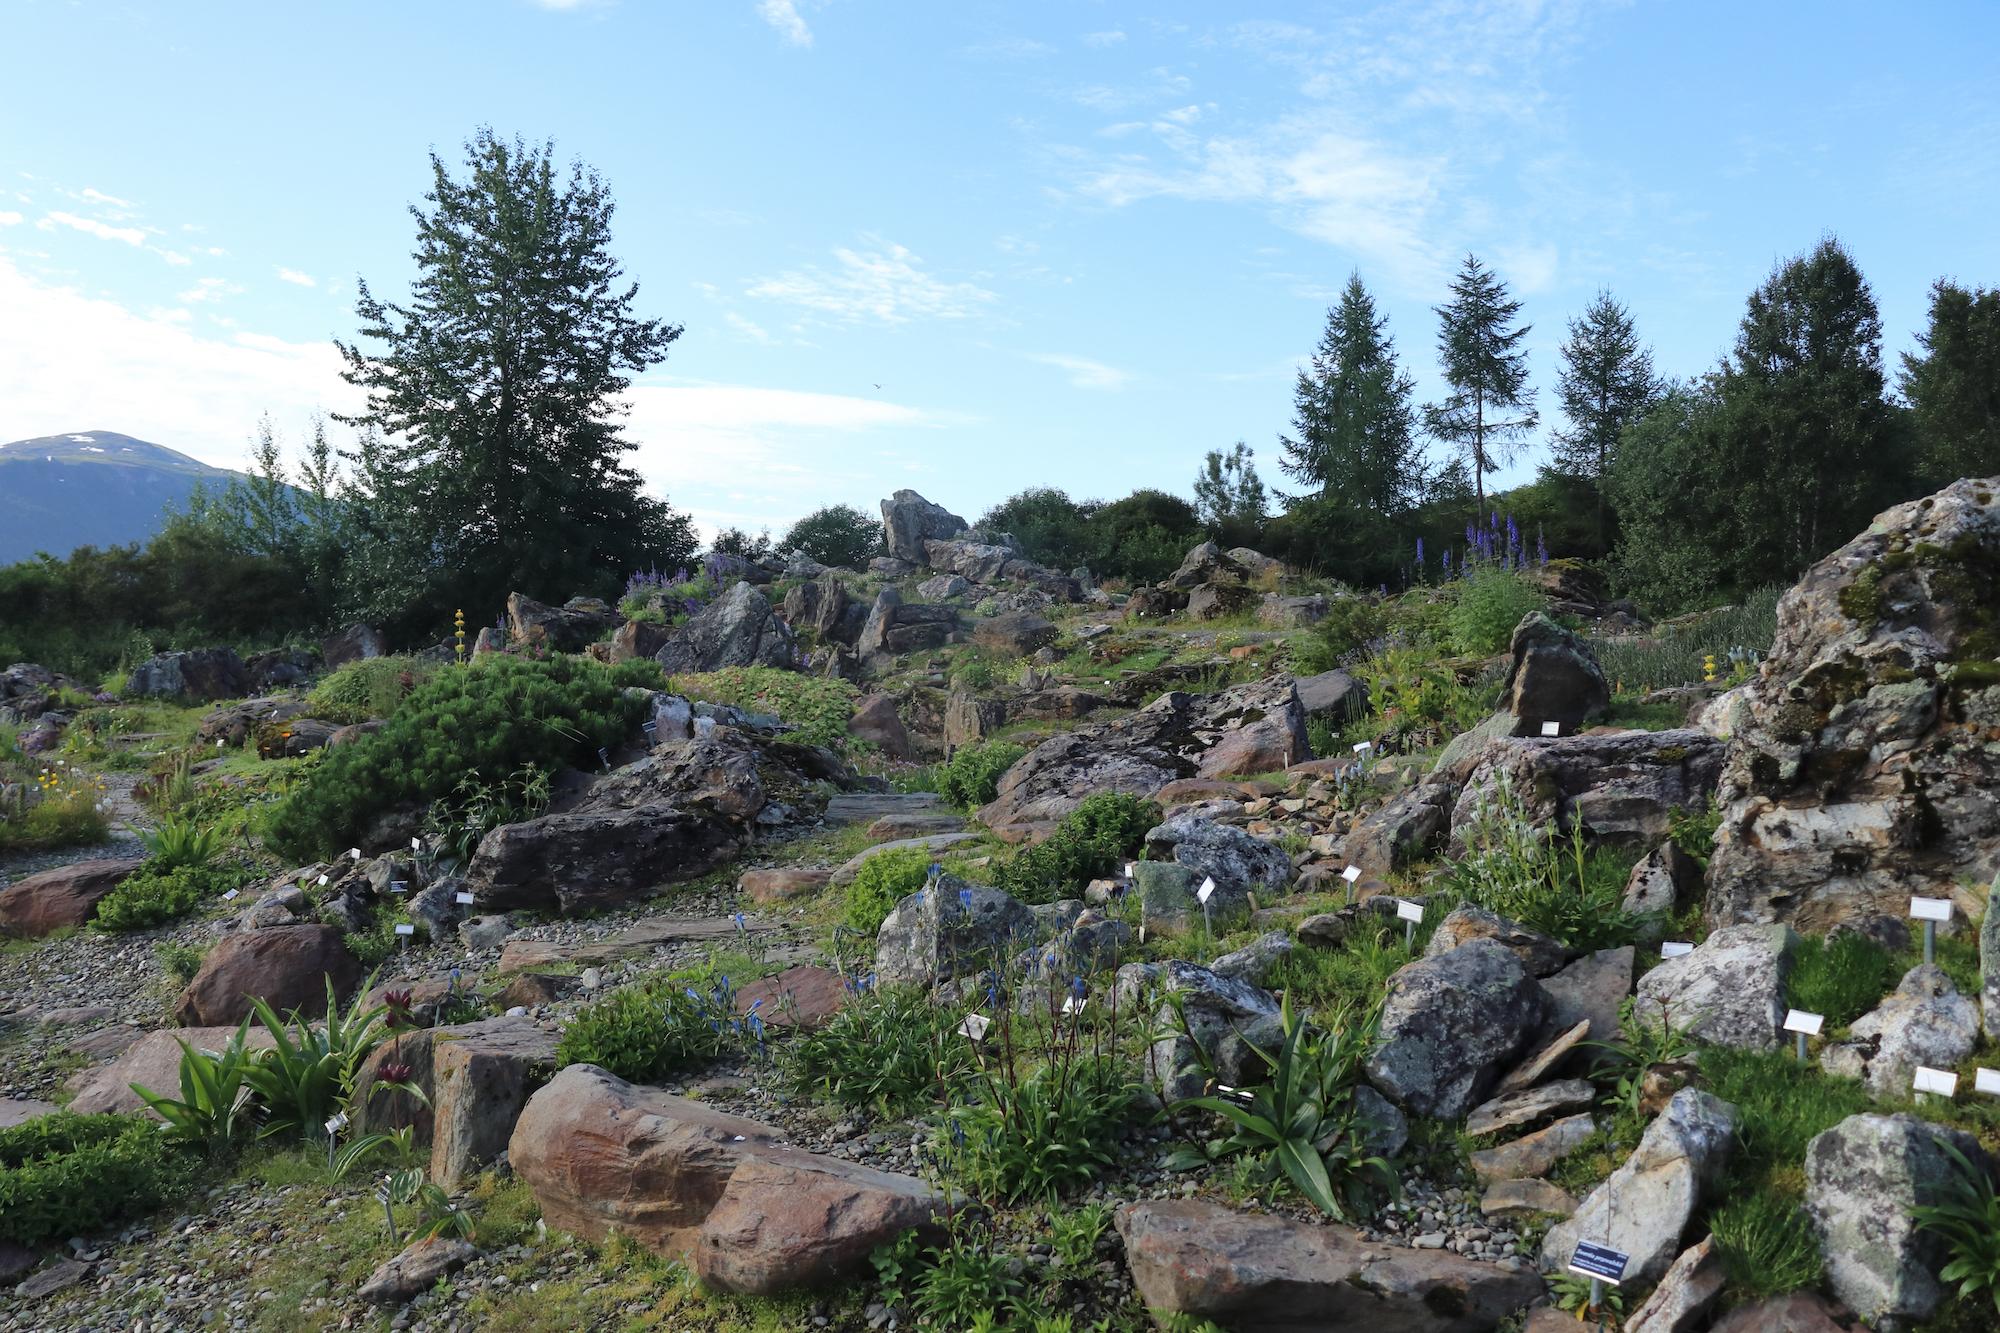 Arctic-Alpine Botanical Garden, Norway